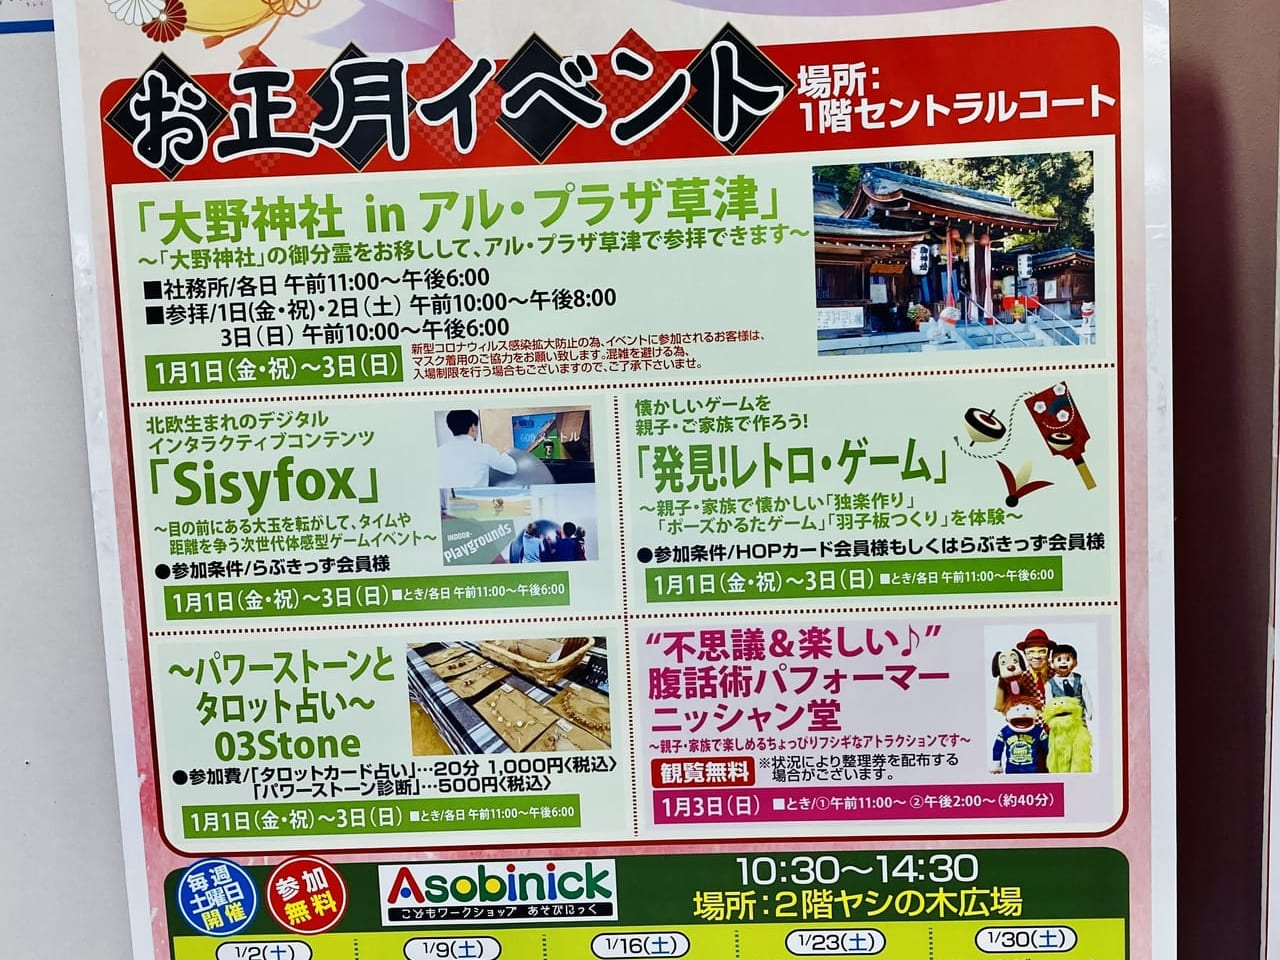 shogatsu event